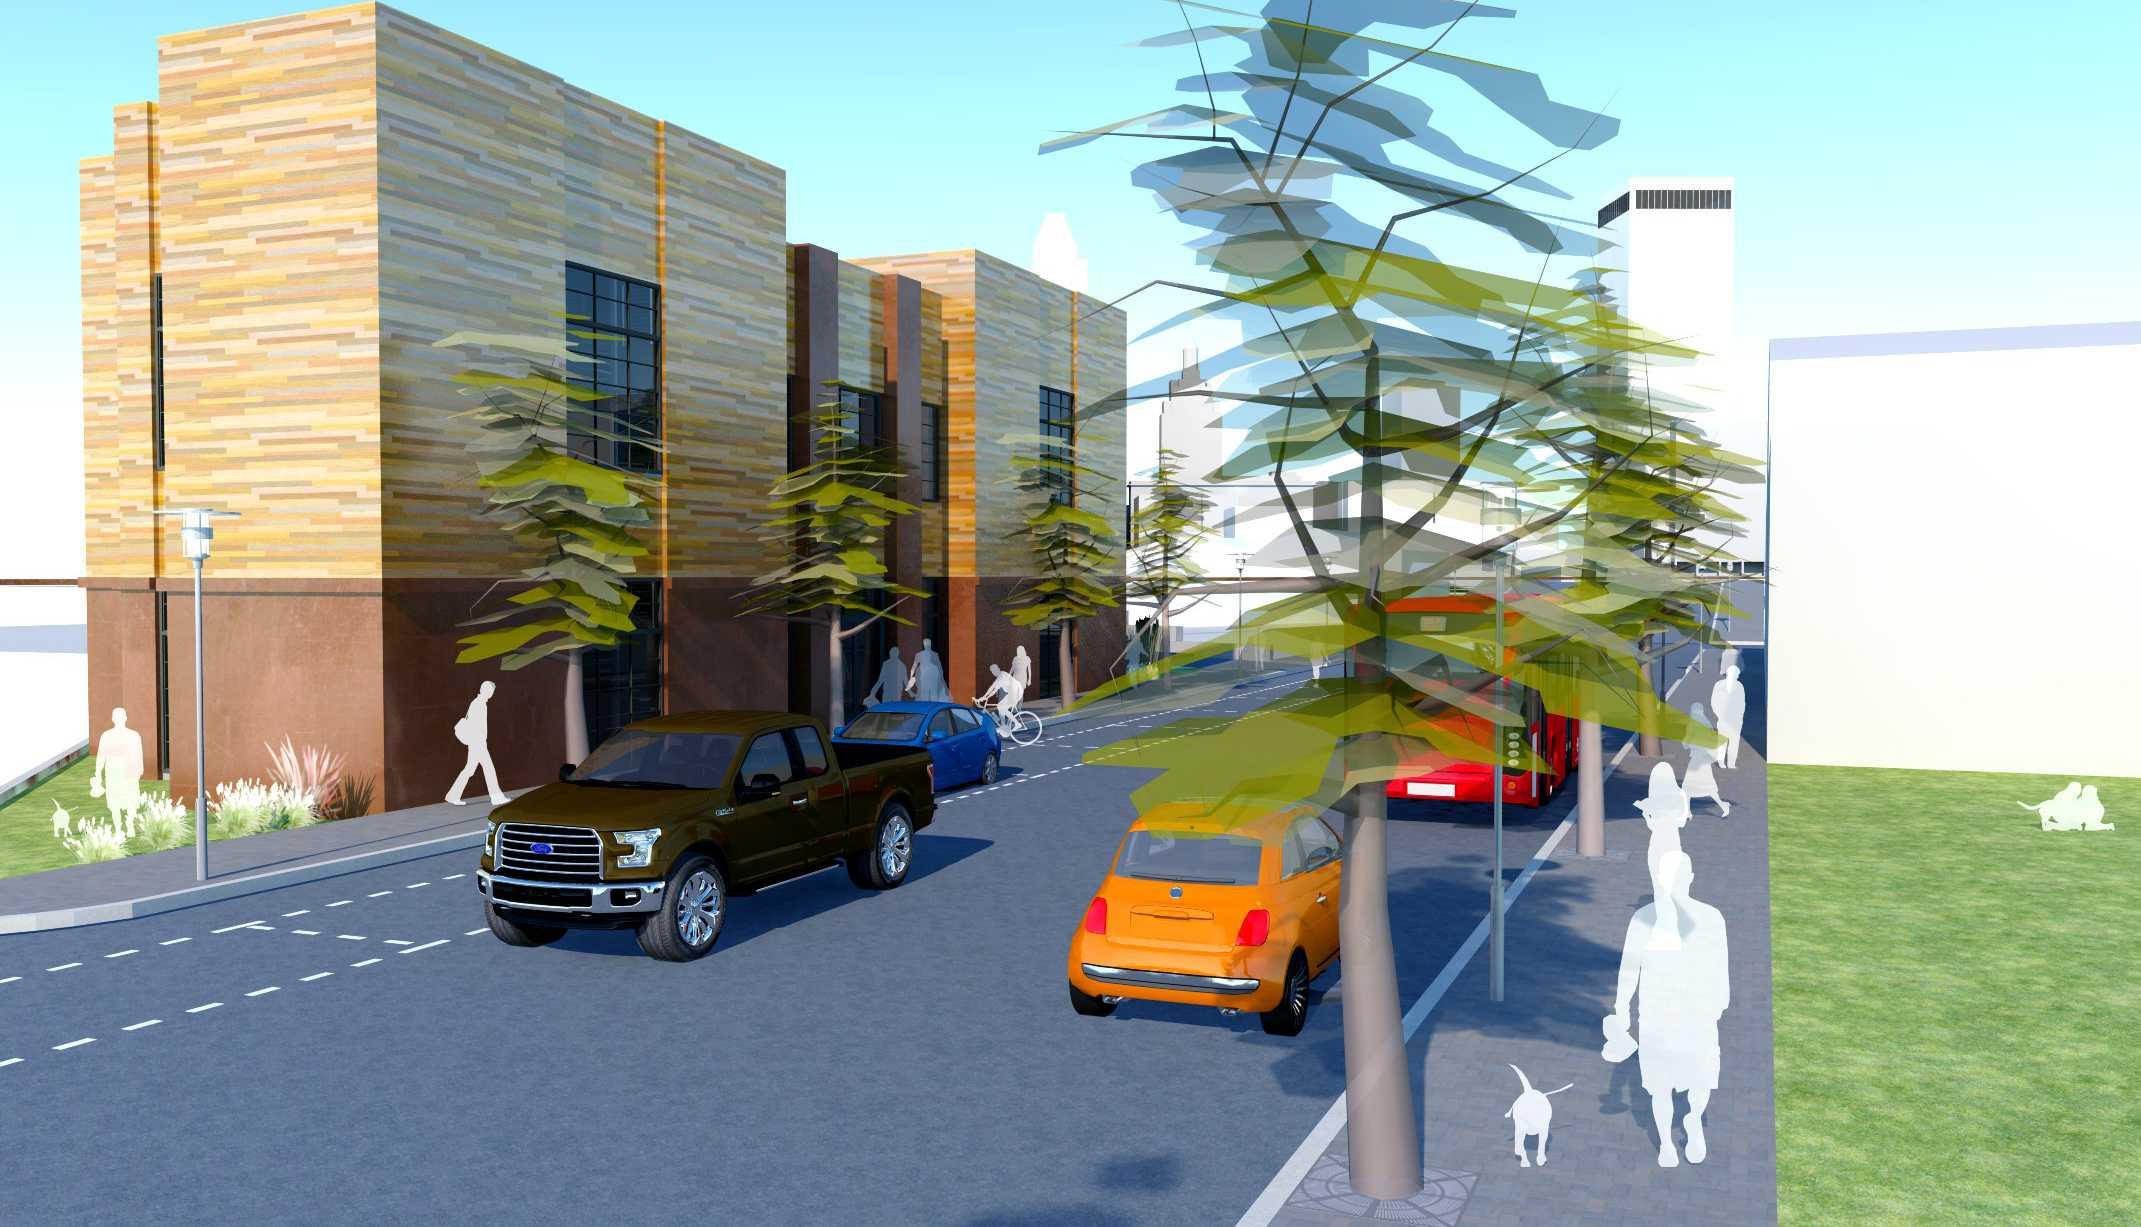 Mixed-use: Development near Downtown Tulsa